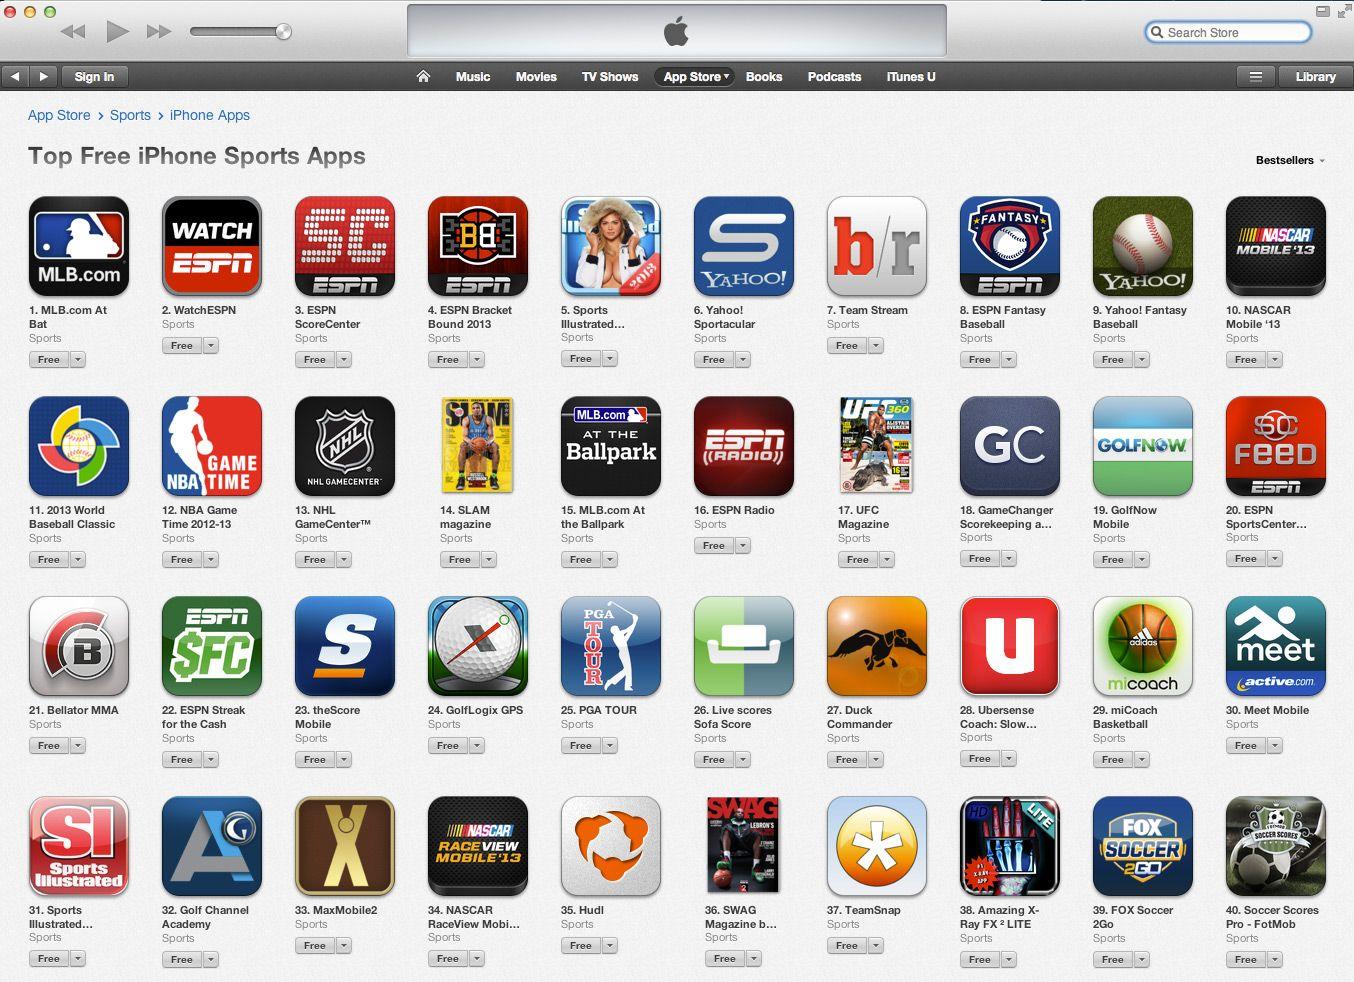 TeamSnap Mobile App in iTunes Top 40 List Blackberry